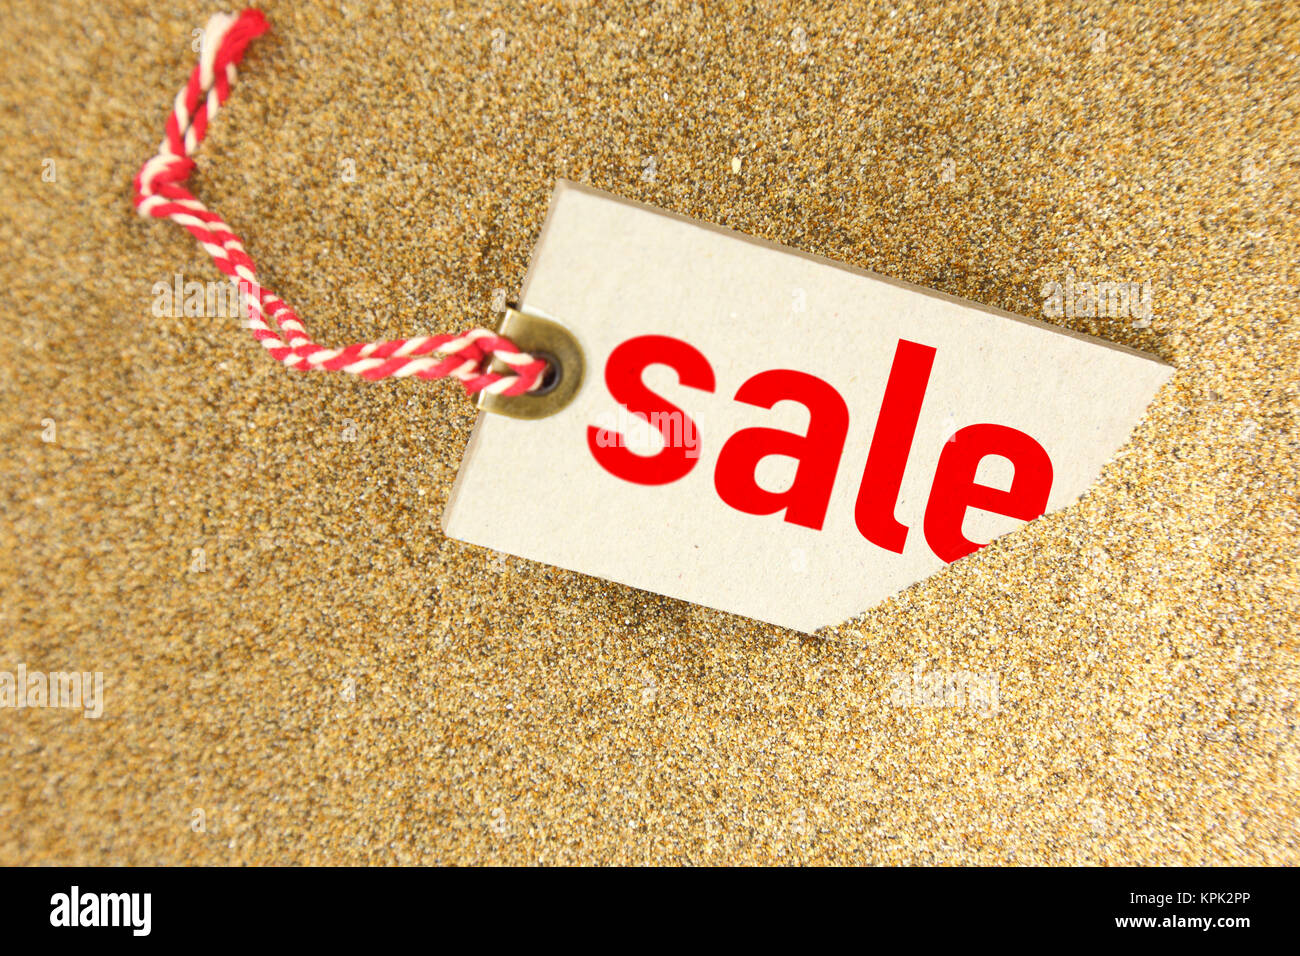 Big sale tag on sand closeup - Stock Image